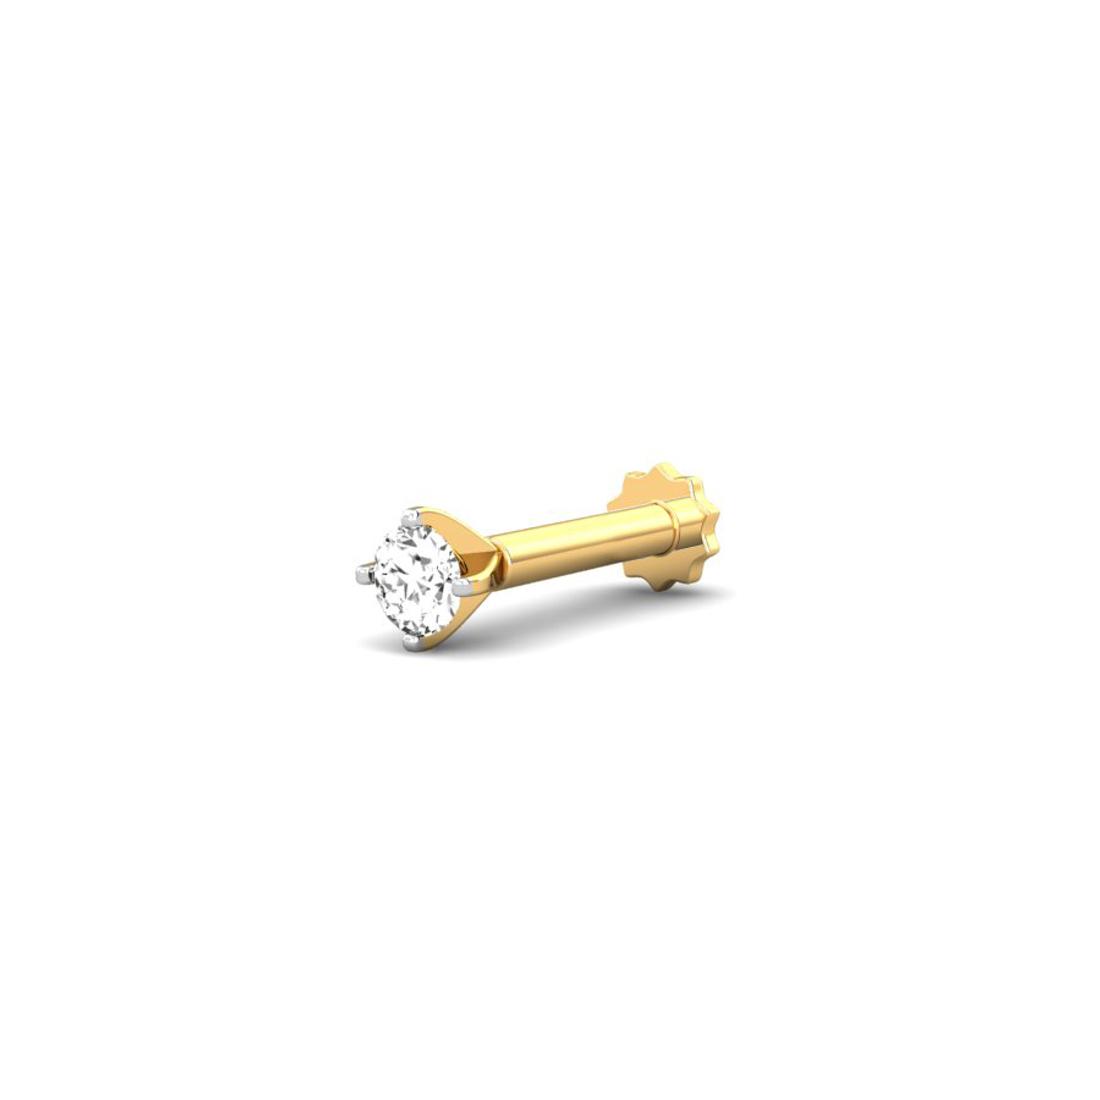 Jewel samarth 18k(750)Yellow Gold and 0.05 ct.(IGI Certified Diamonds) Nose pin